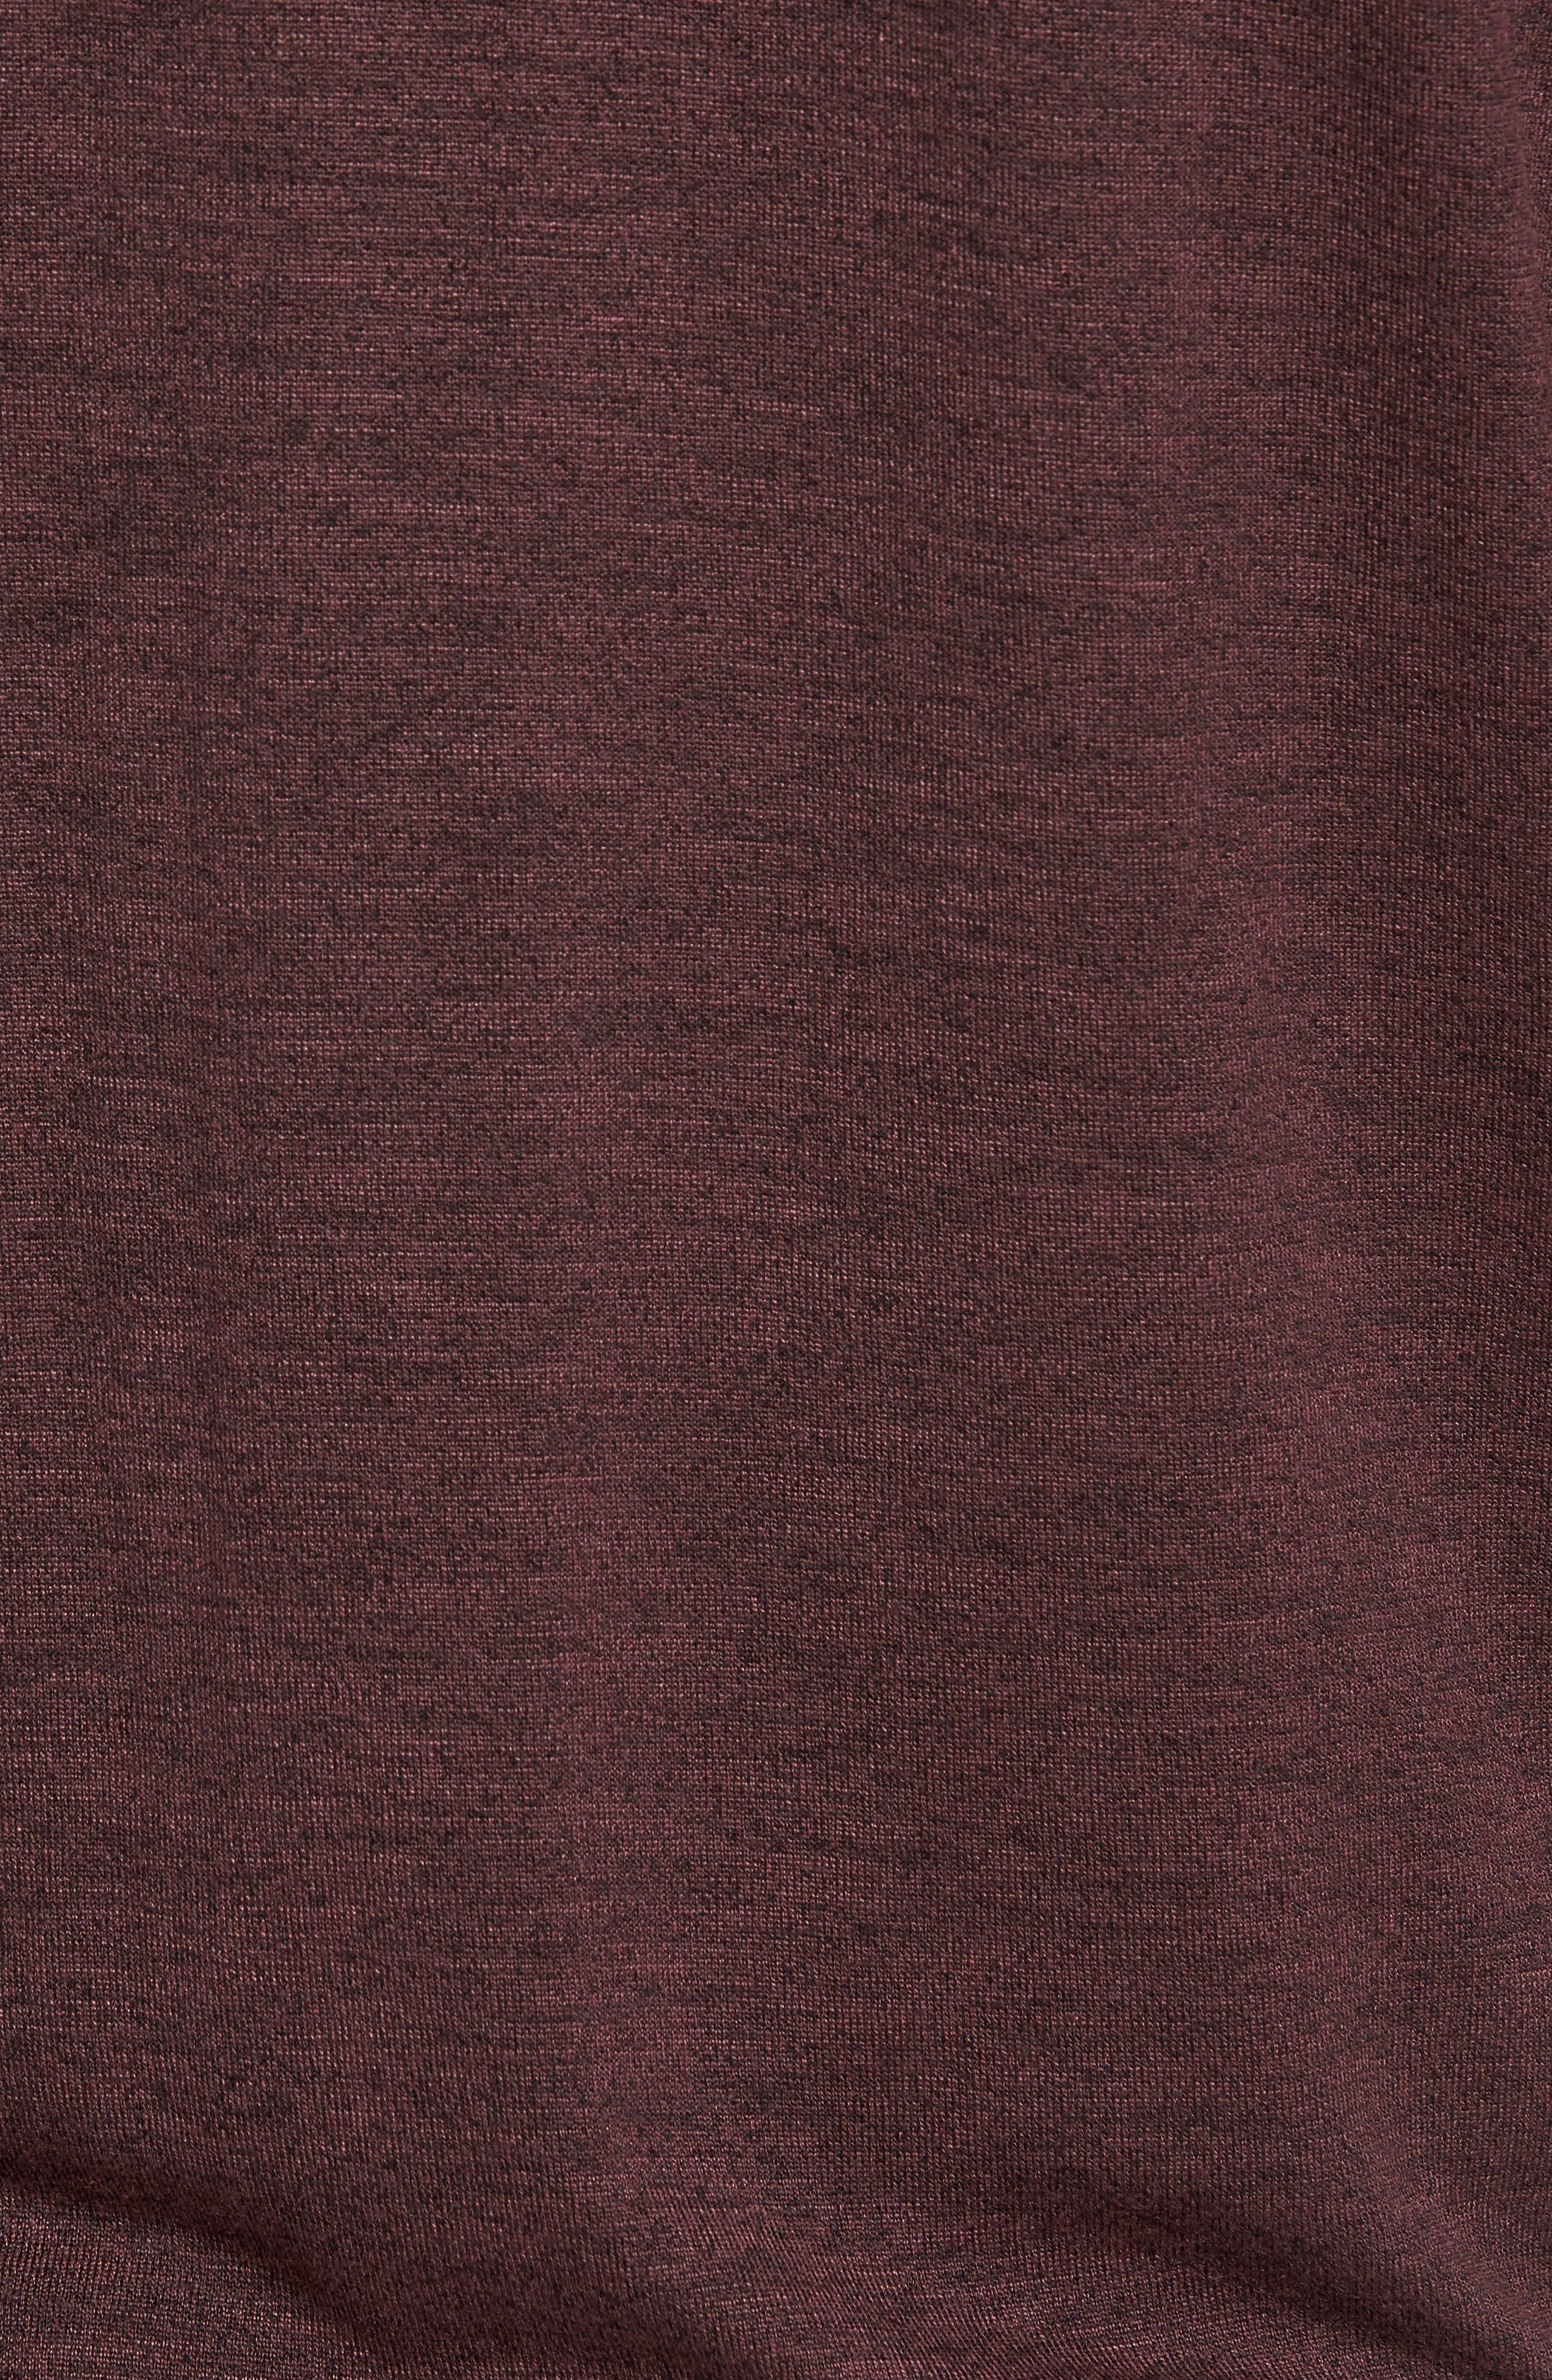 Long Sleeve T-Shirt,                             Alternate thumbnail 34, color,